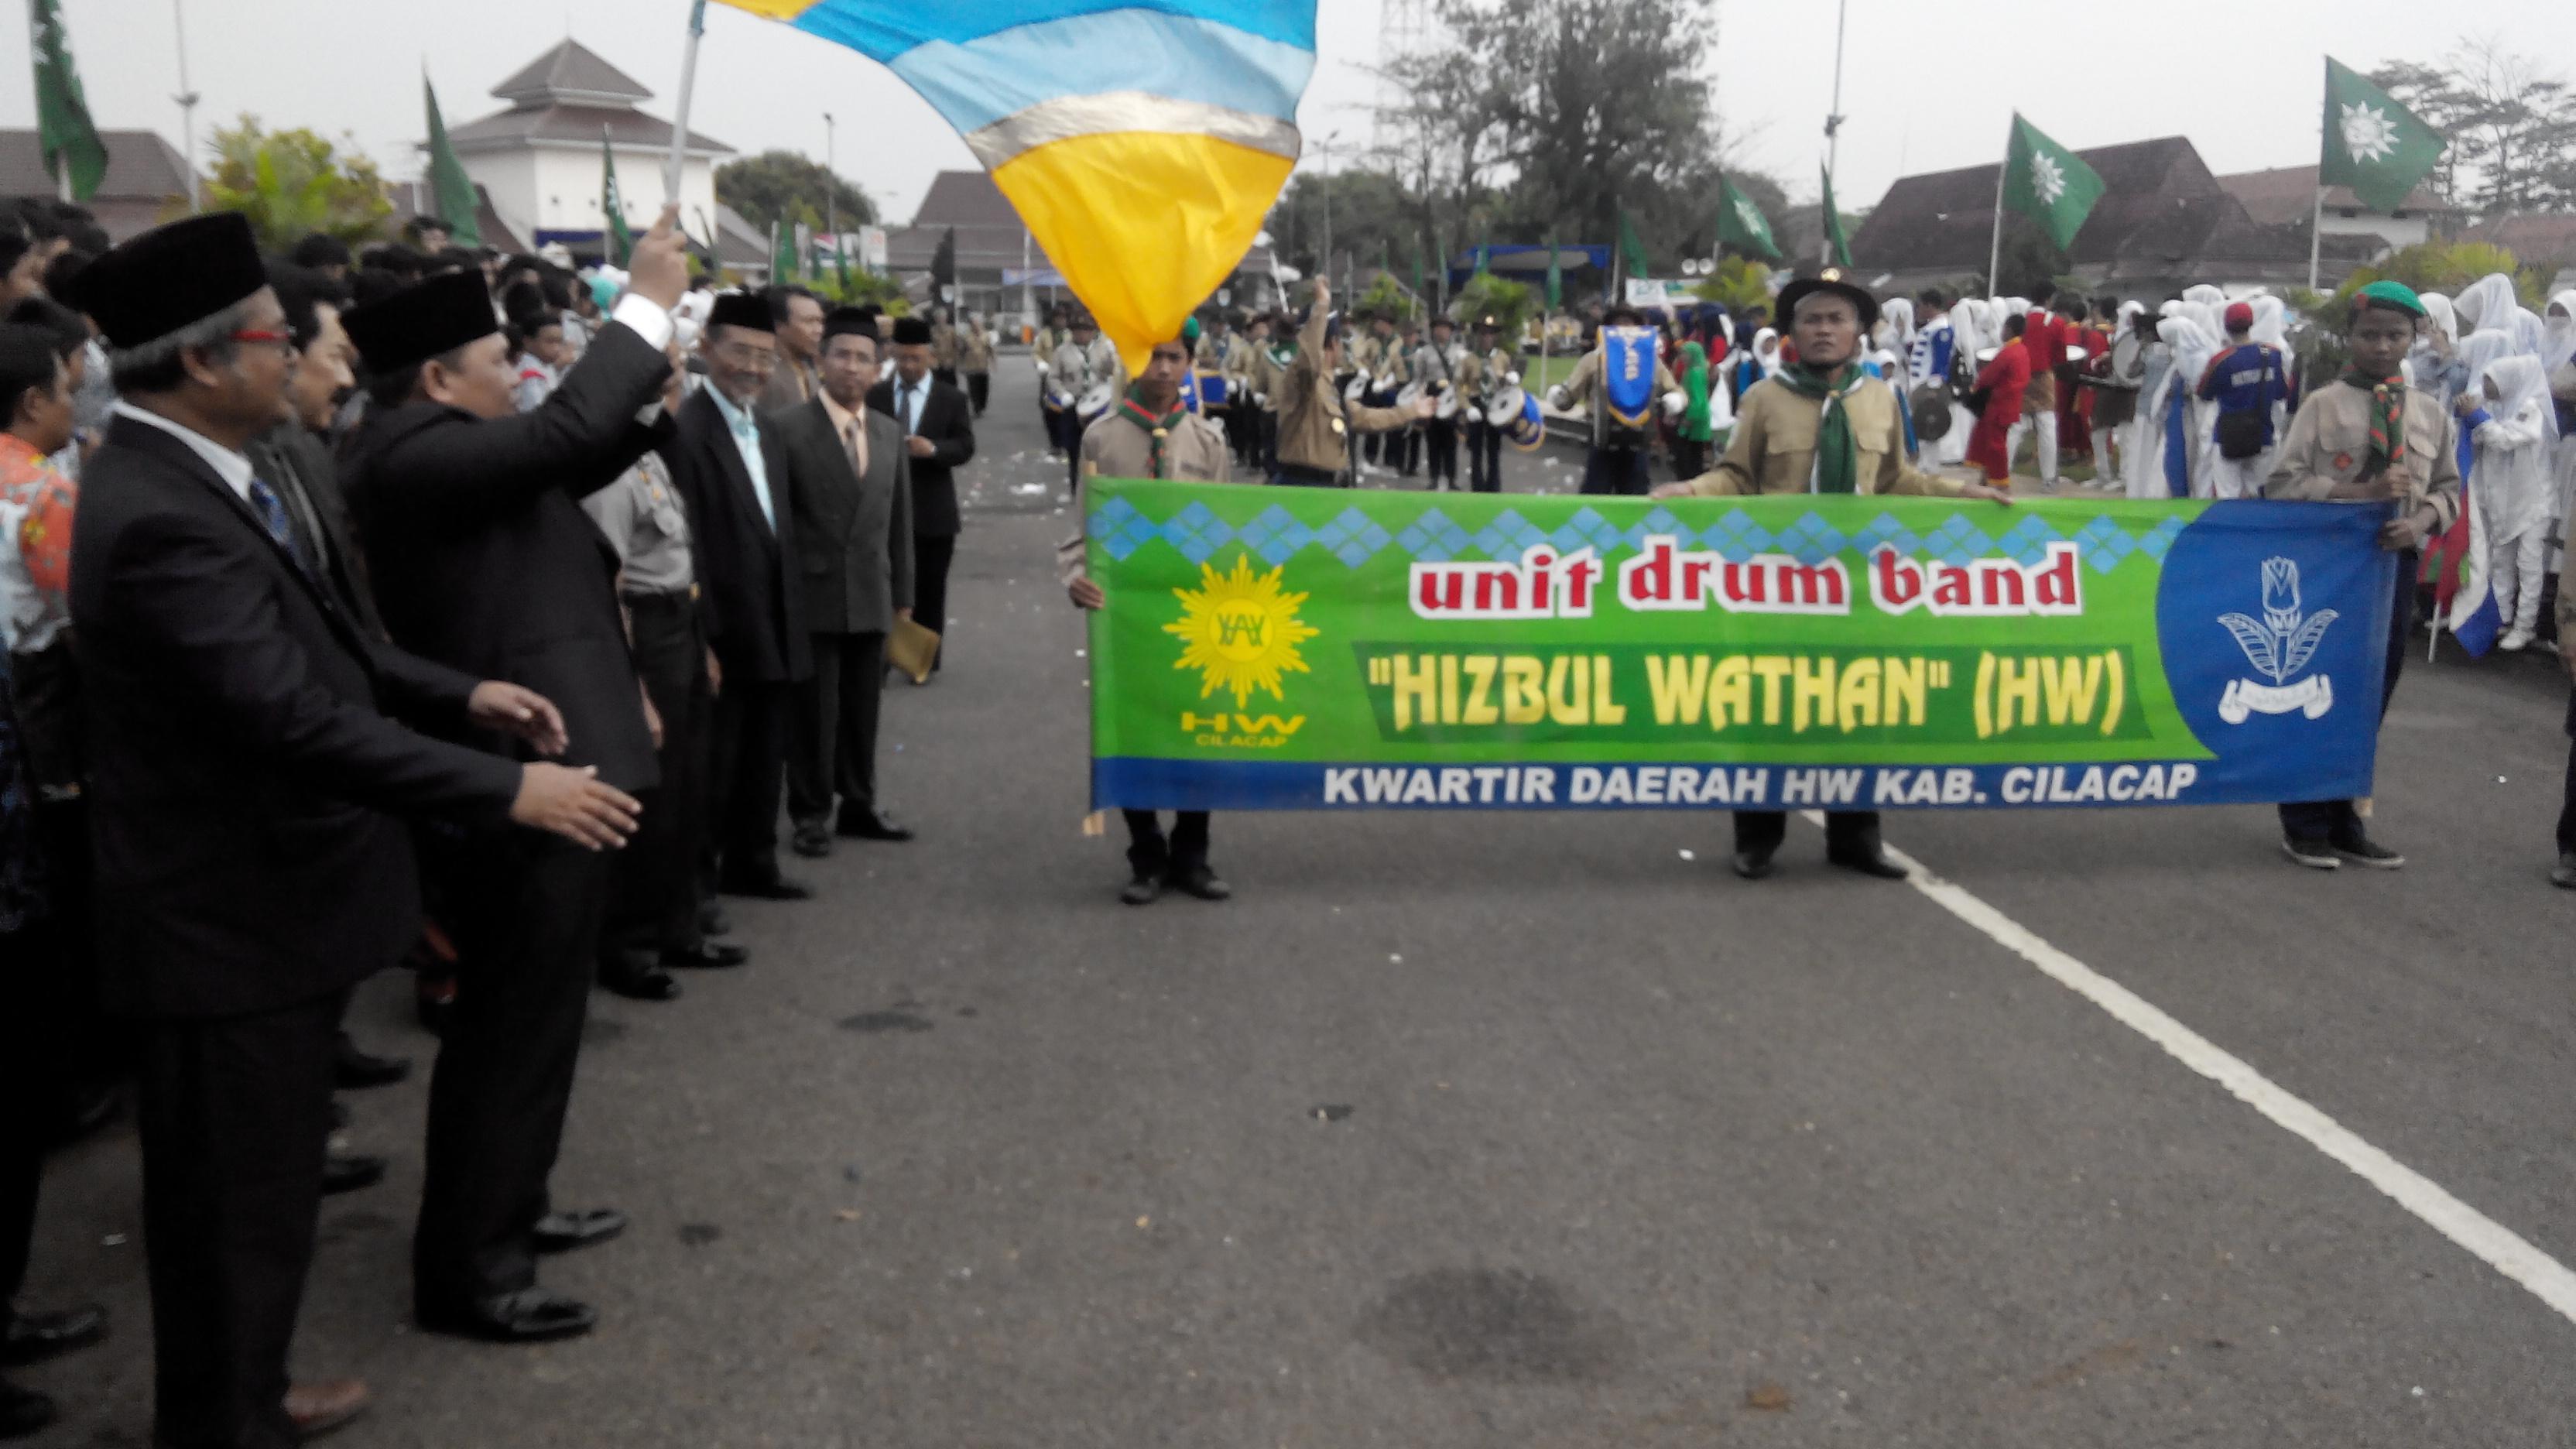 104 2 Fm Radio Kebanggaan Cilacap Memeriahkan Milad Muhammadiyah 105